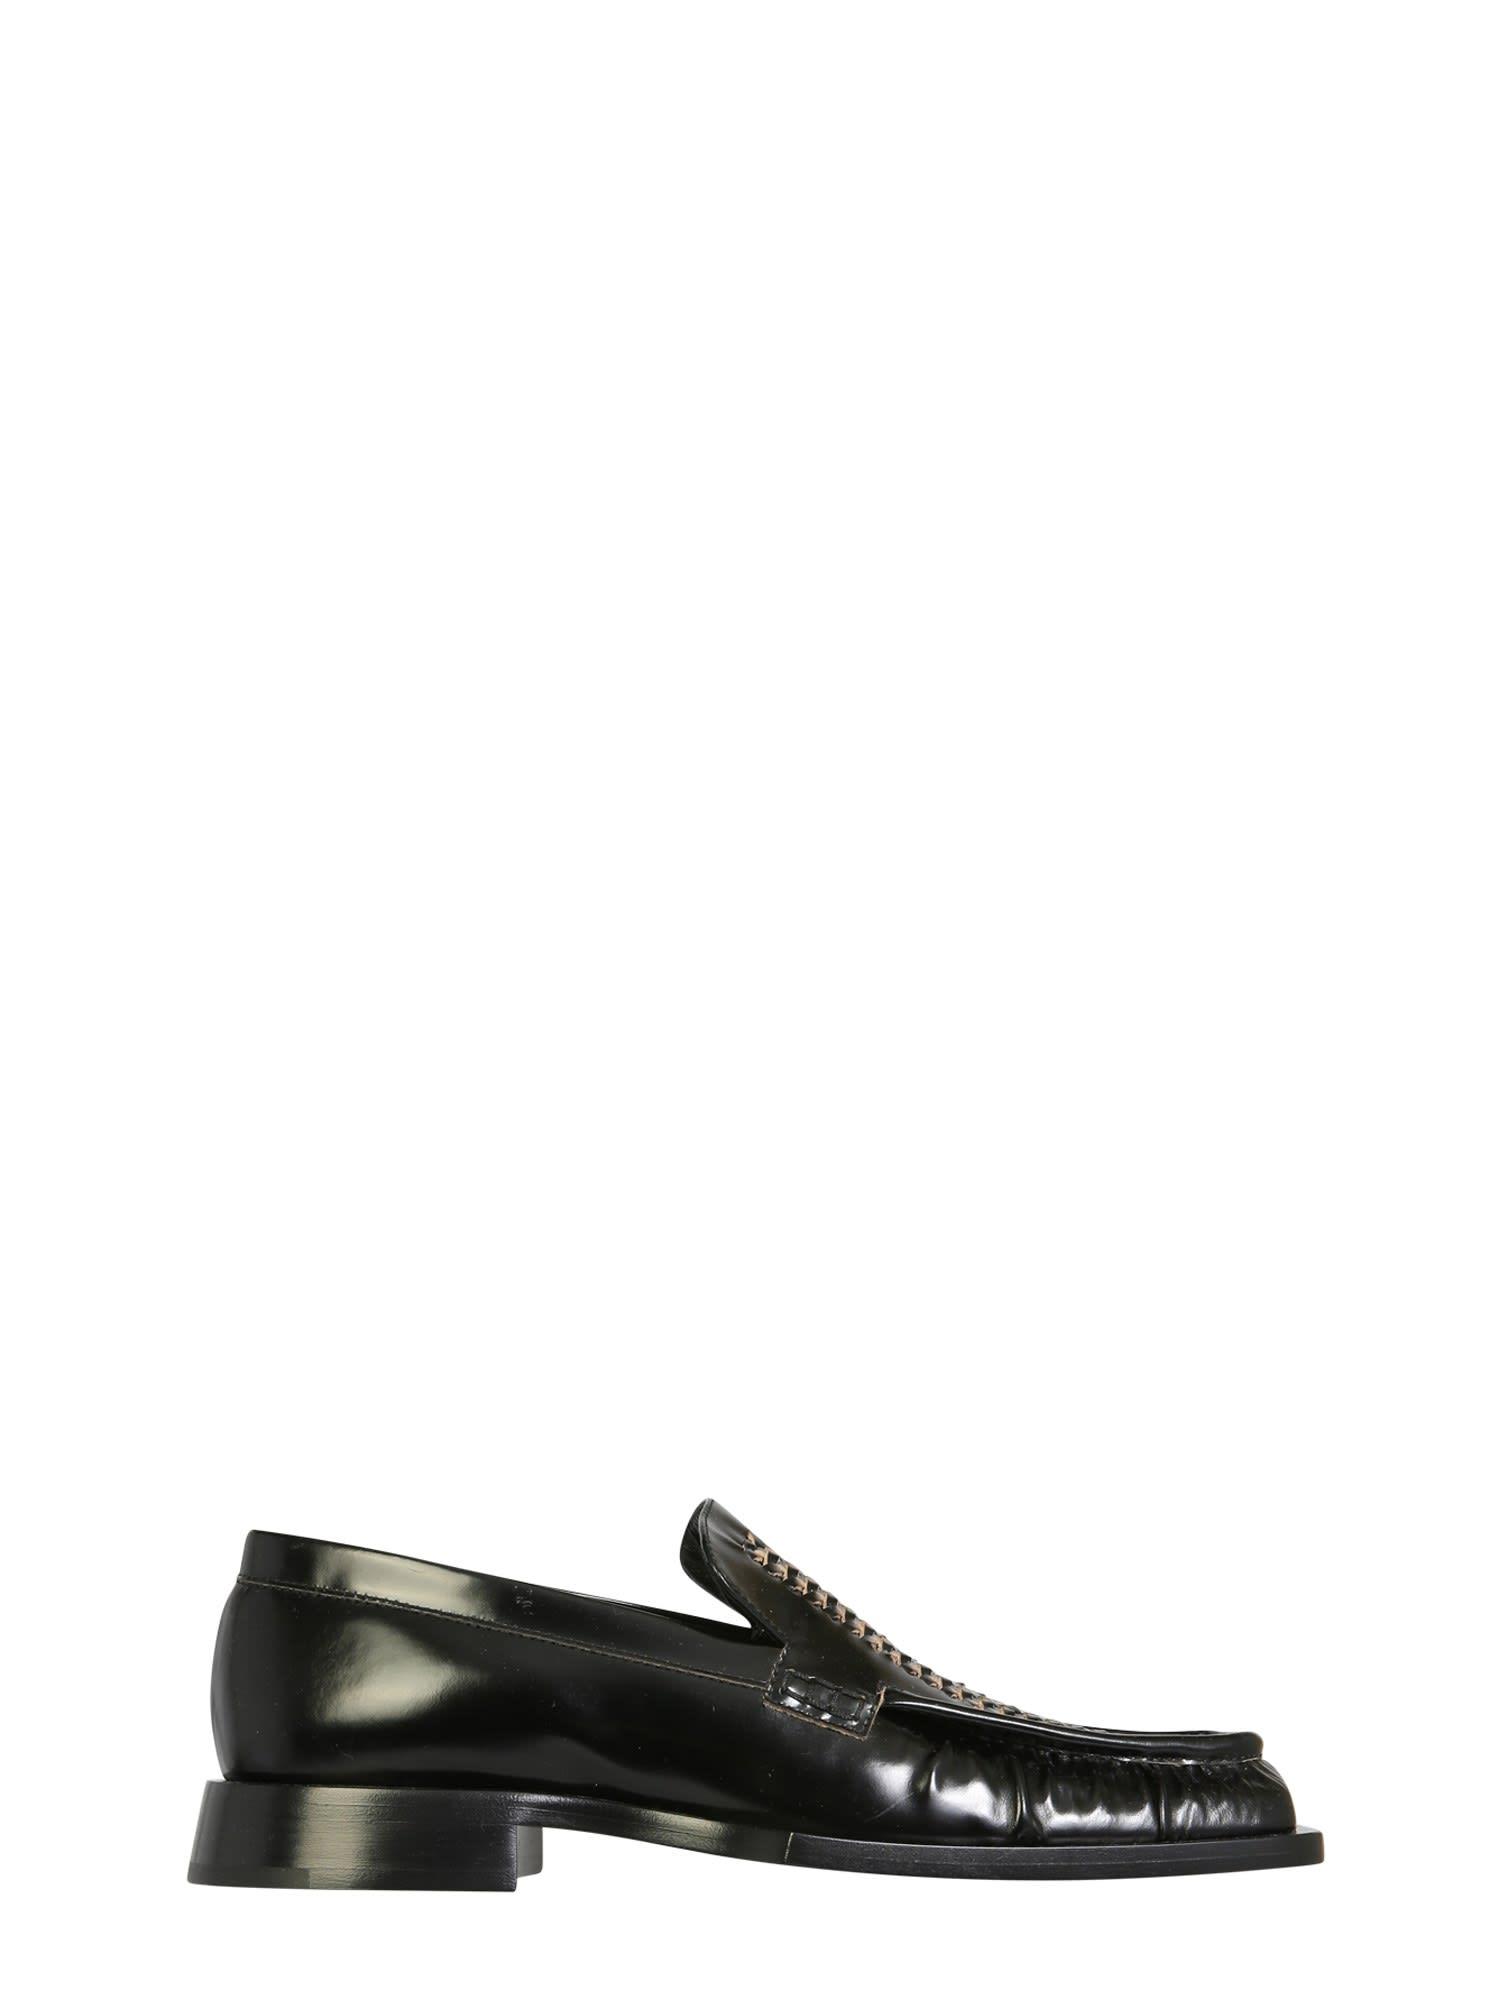 Buy Jil Sander Leather Moccasins online, shop Jil Sander shoes with free shipping